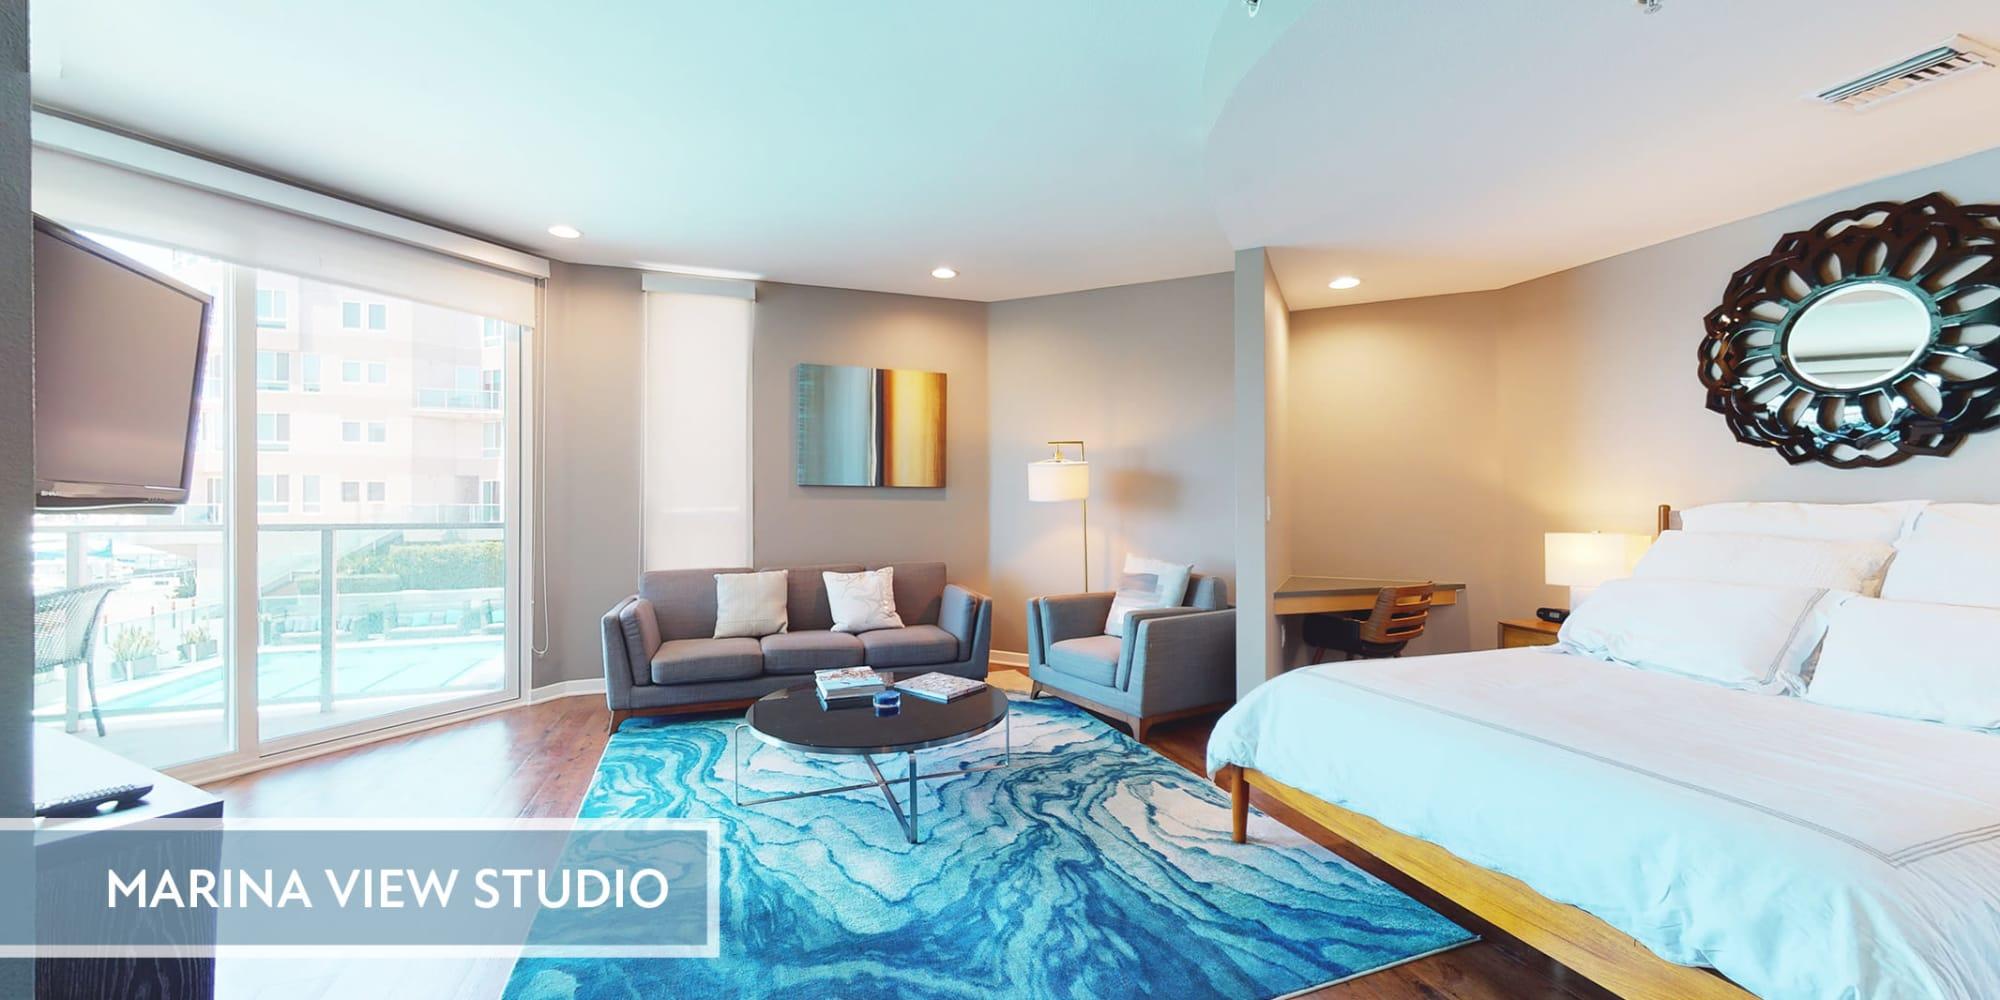 Spacious studio apartment with views of the marina at Esprit Marina del Rey in Marina del Rey, California